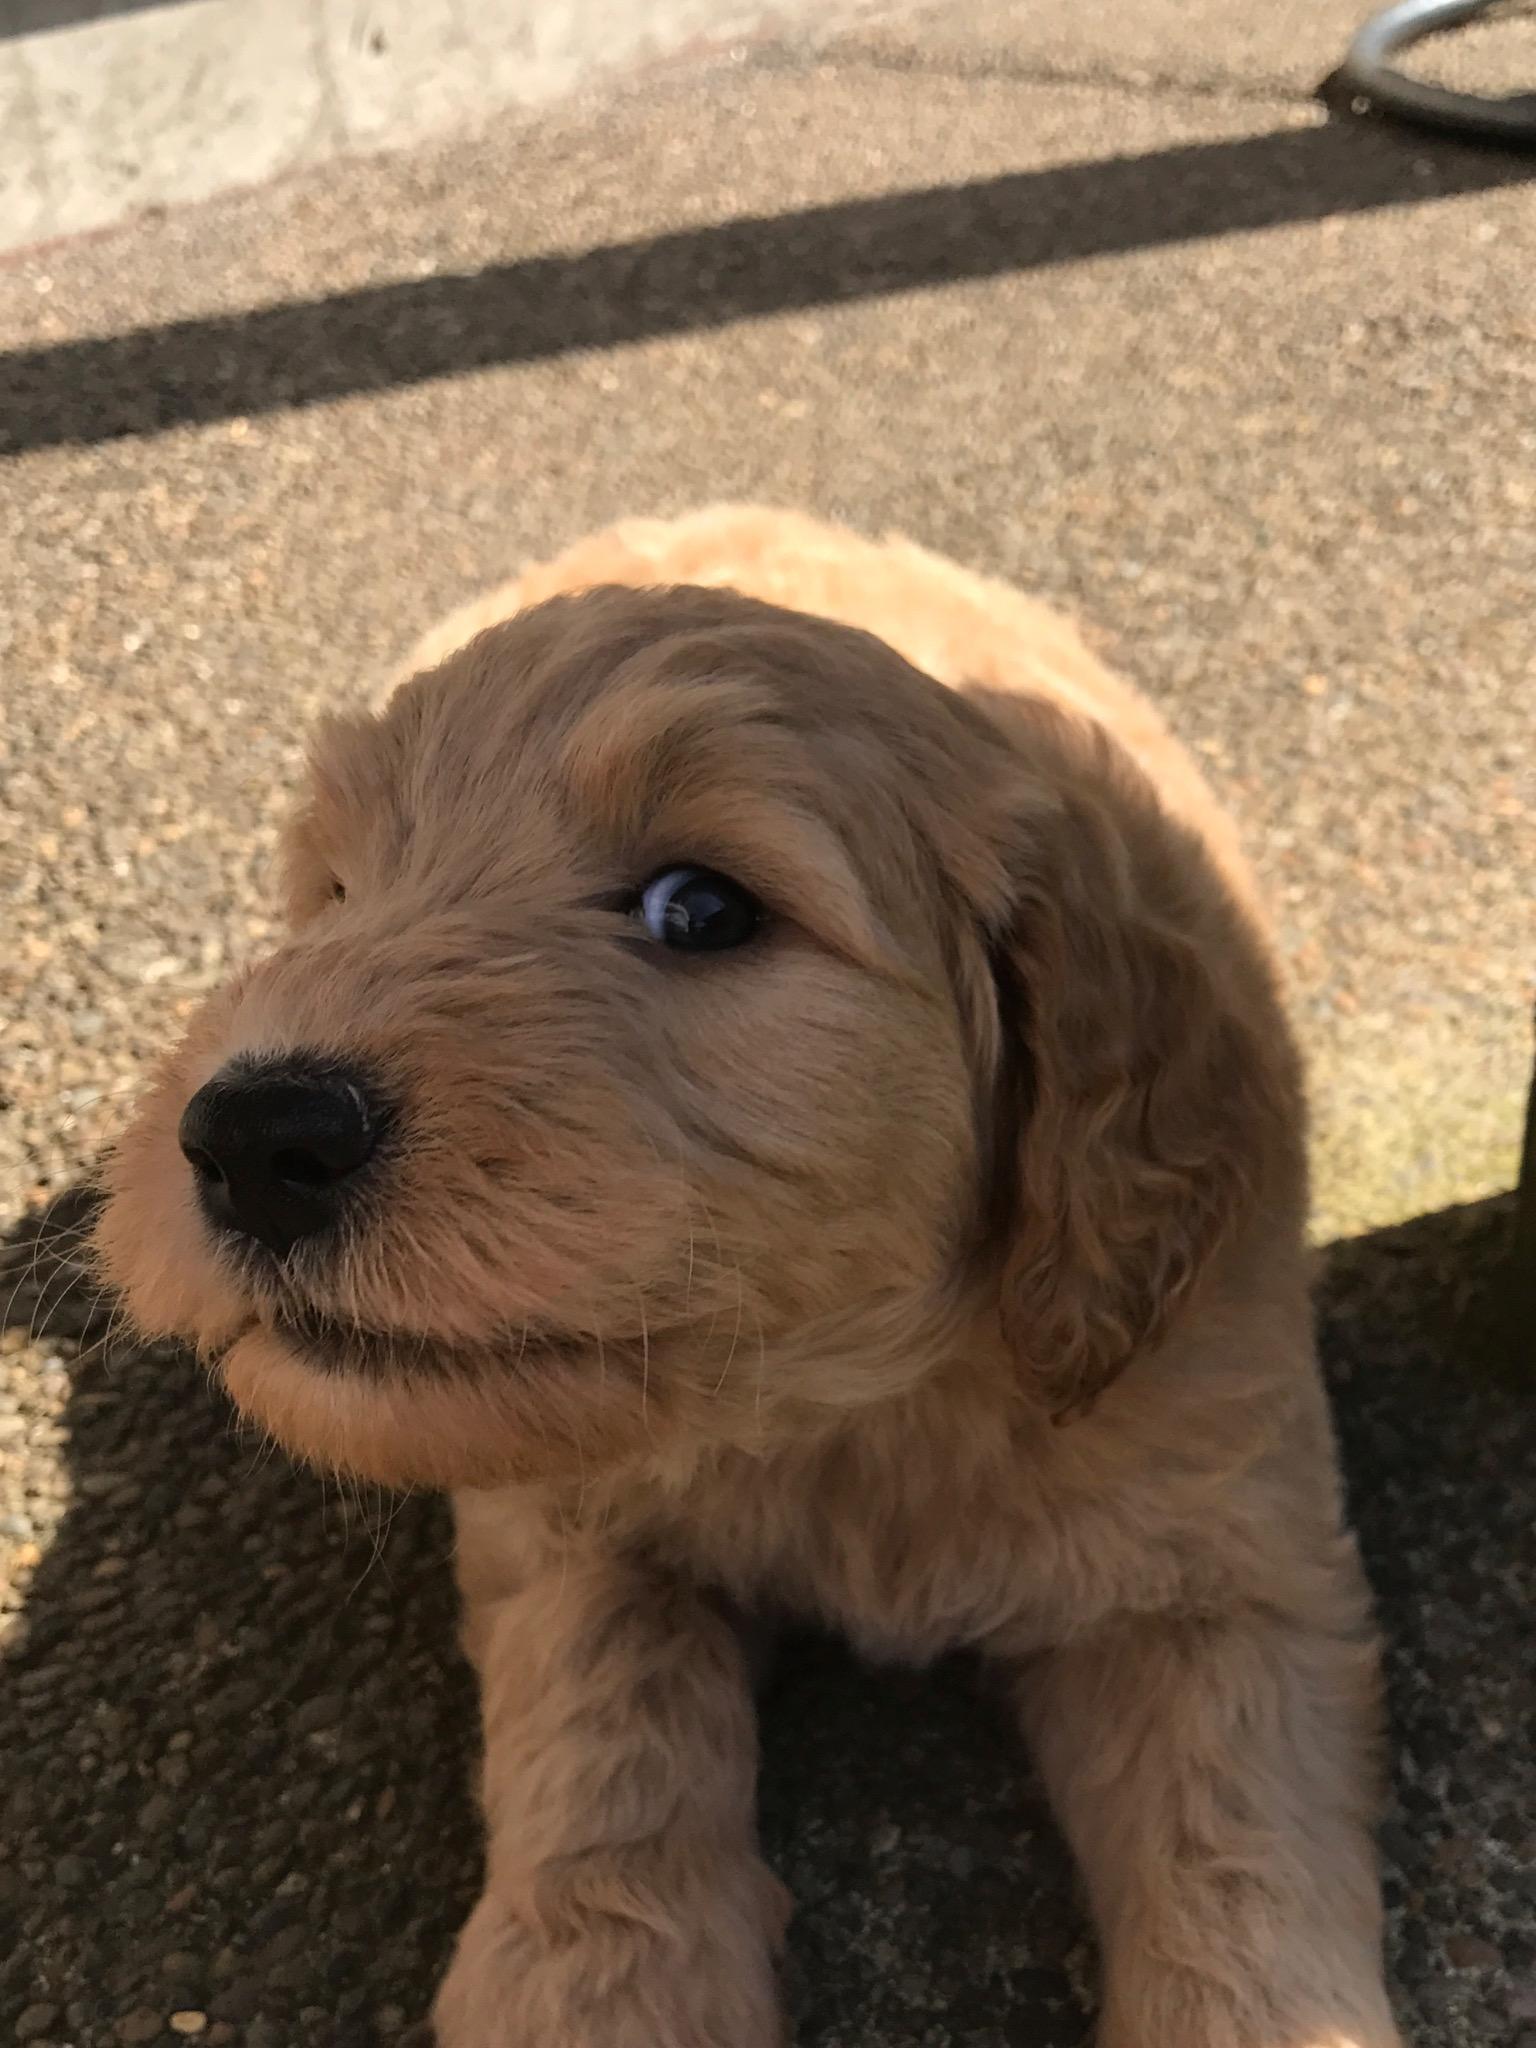 Brand new puppies!